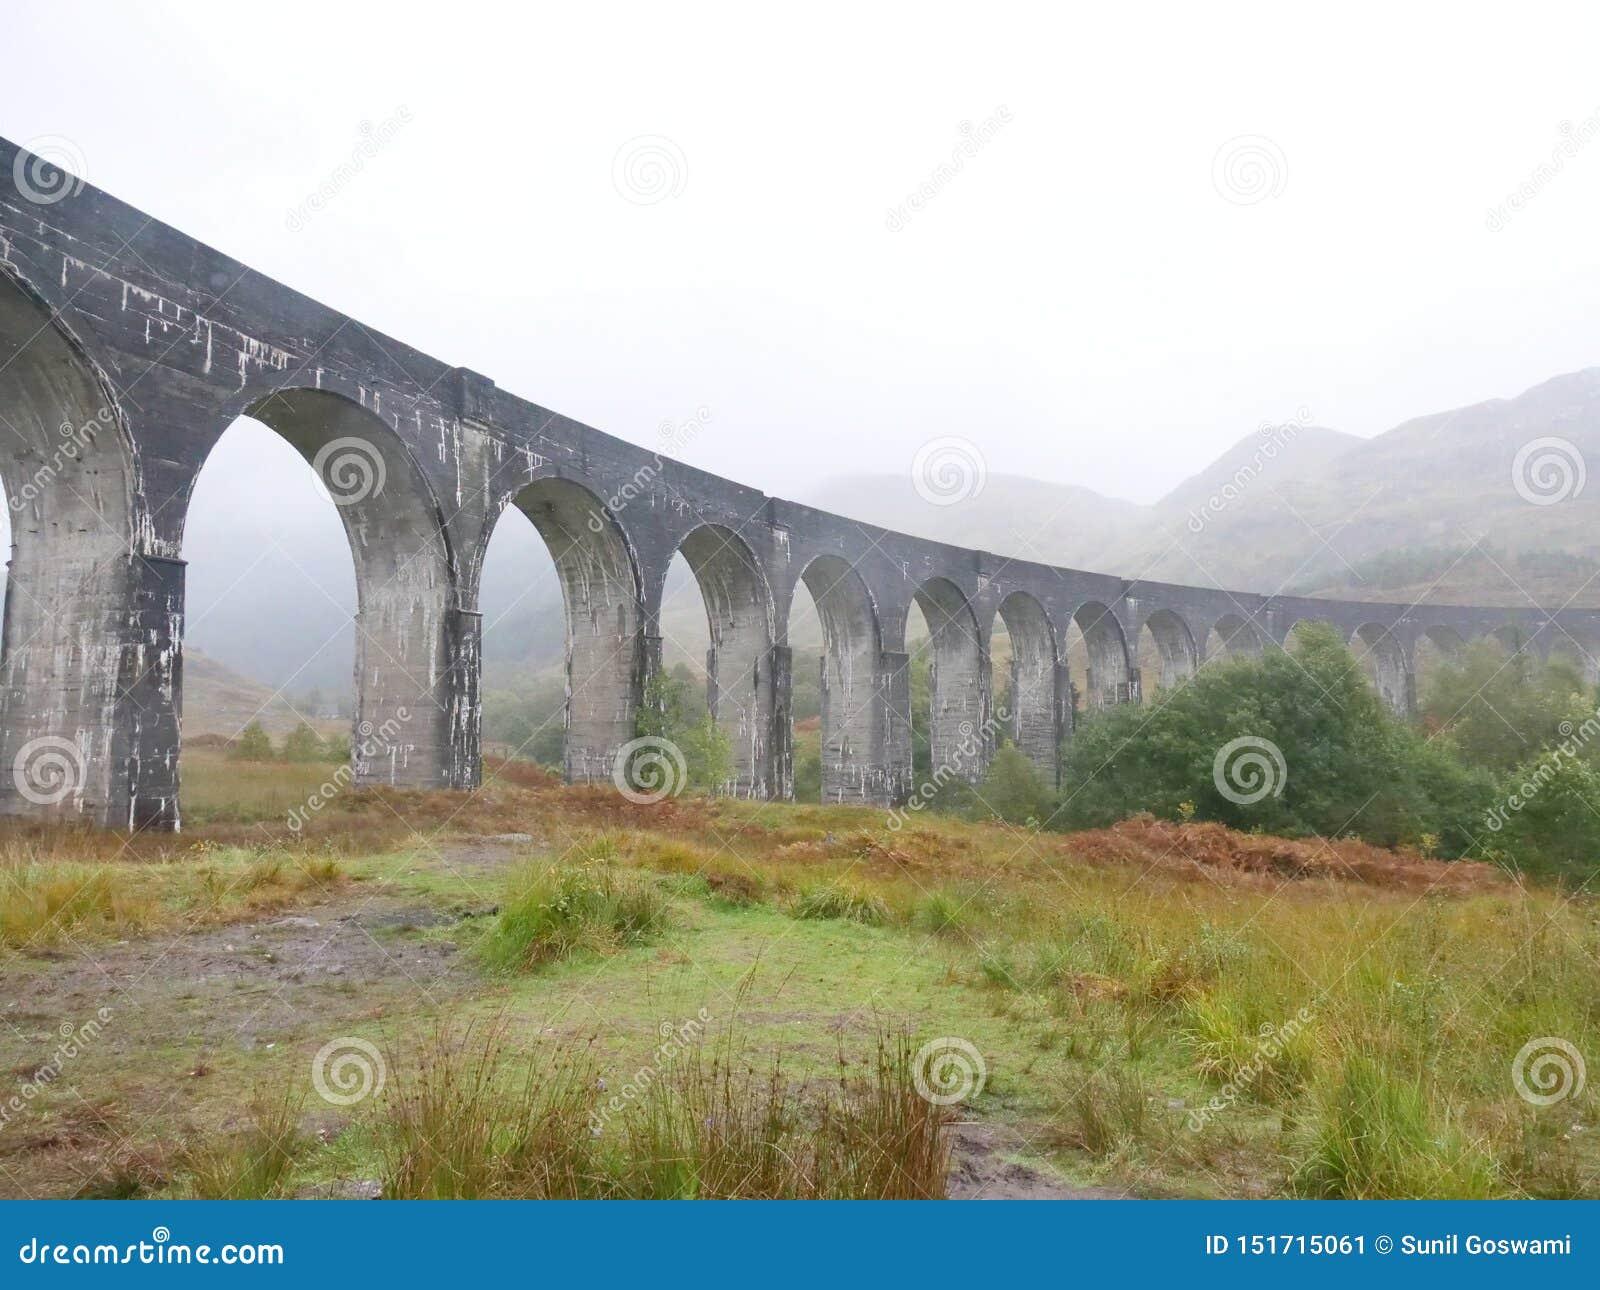 Glenfinnan train bridge